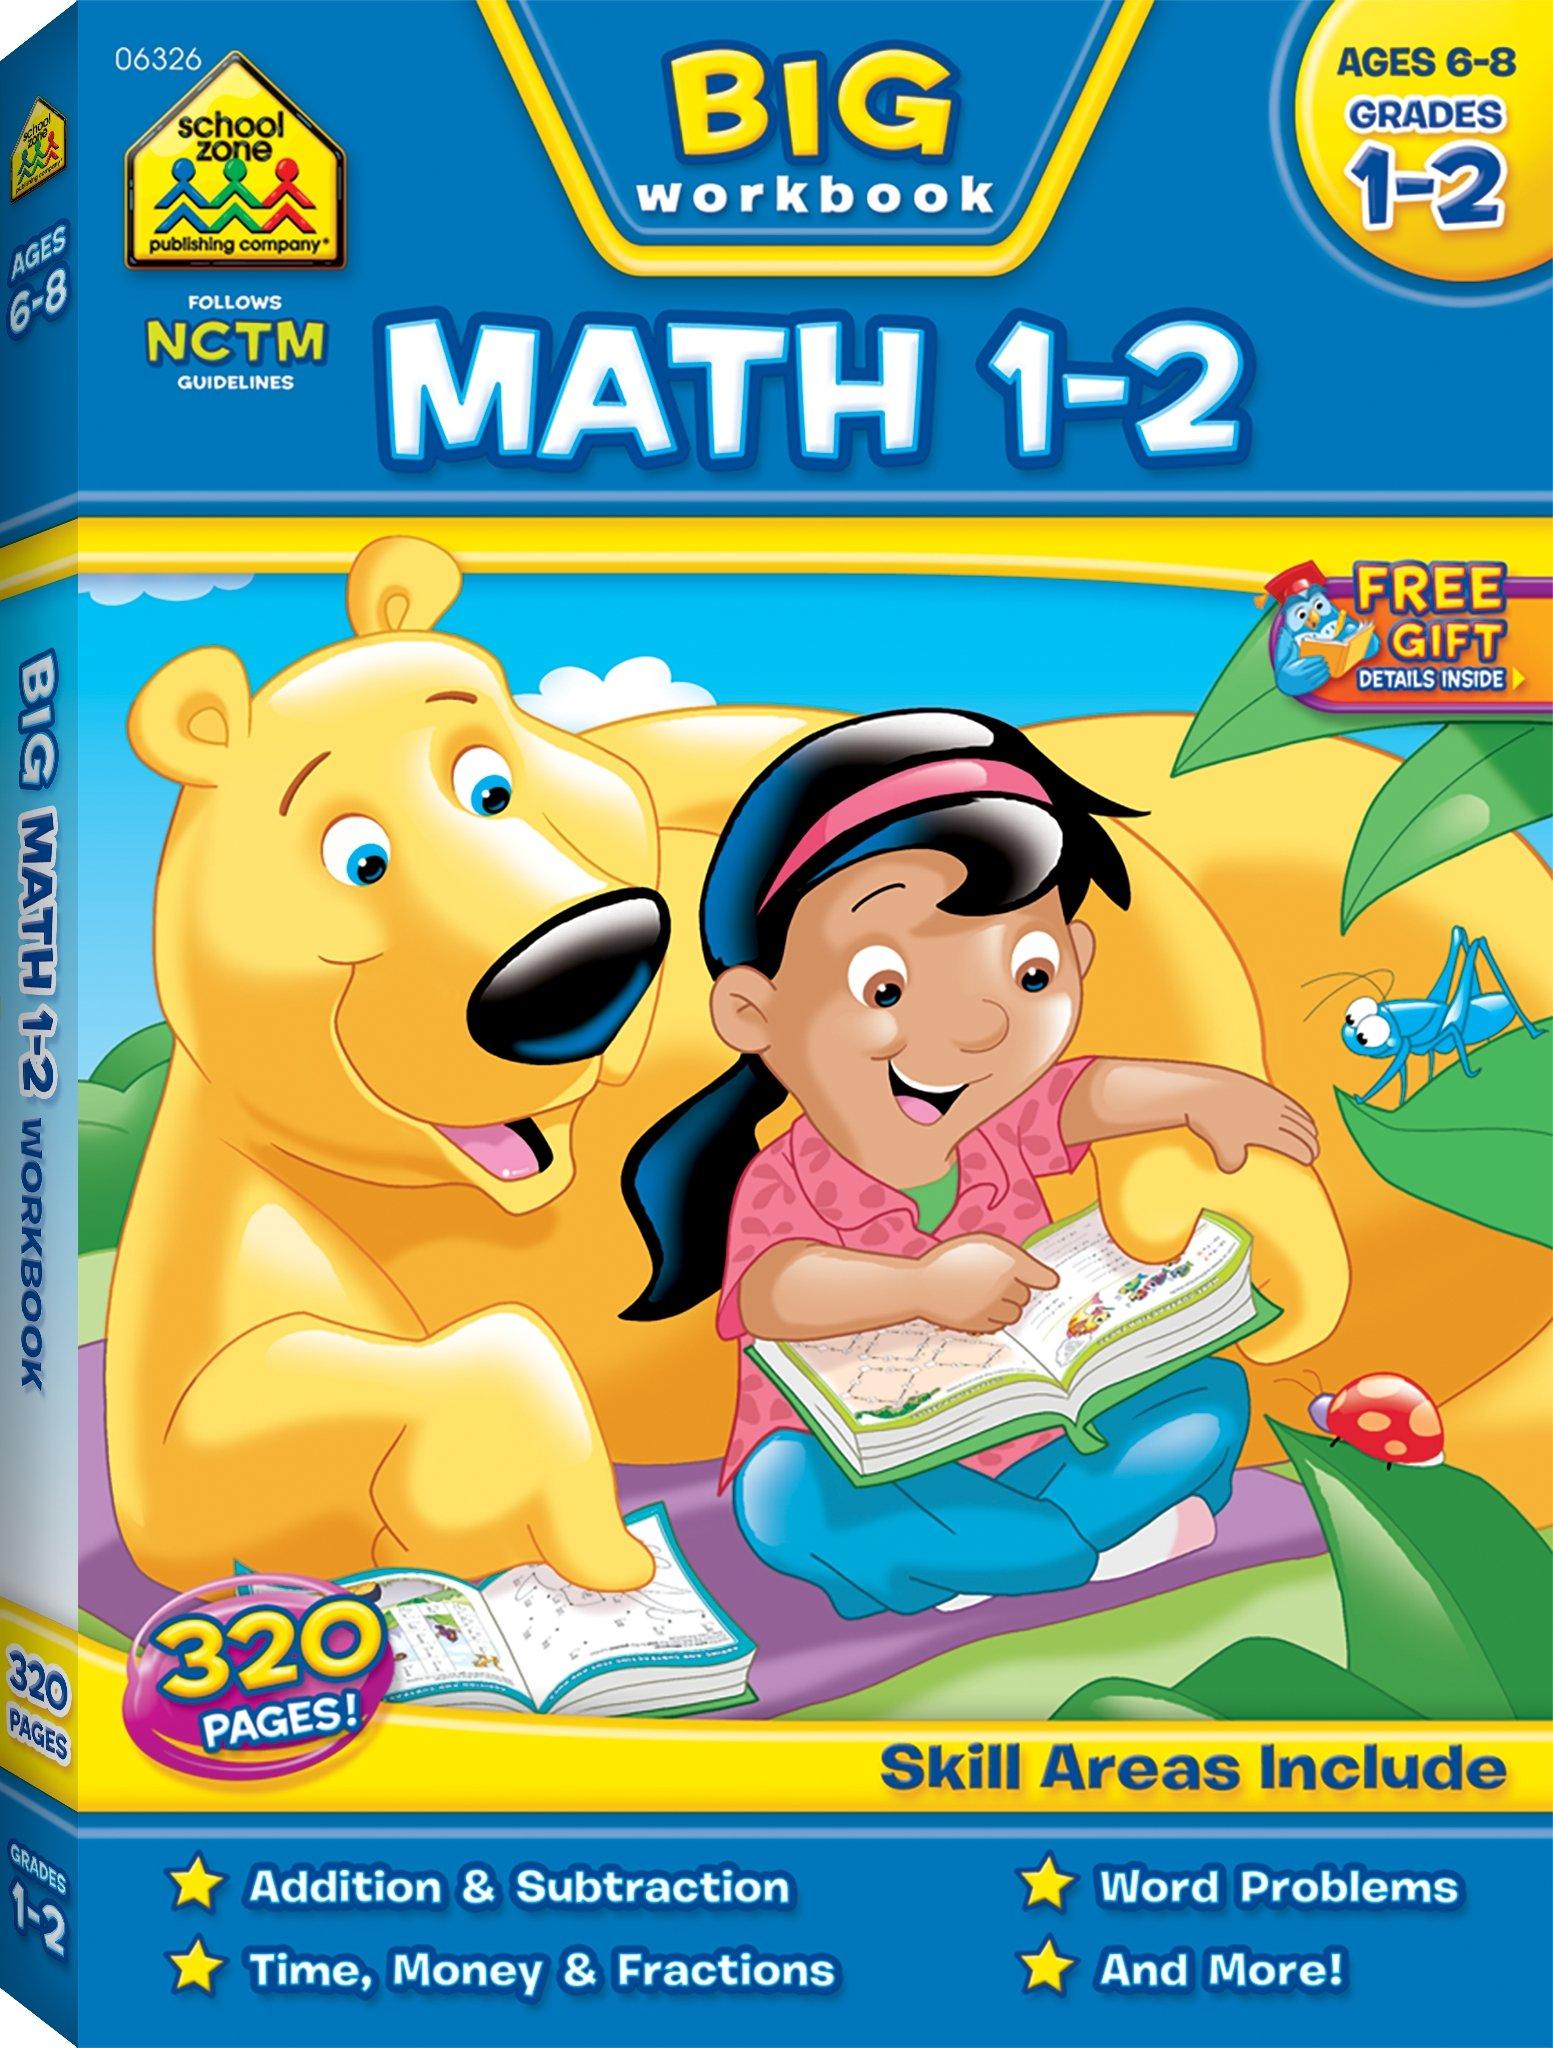 Math Workbook Barbara Bando Irvin product image